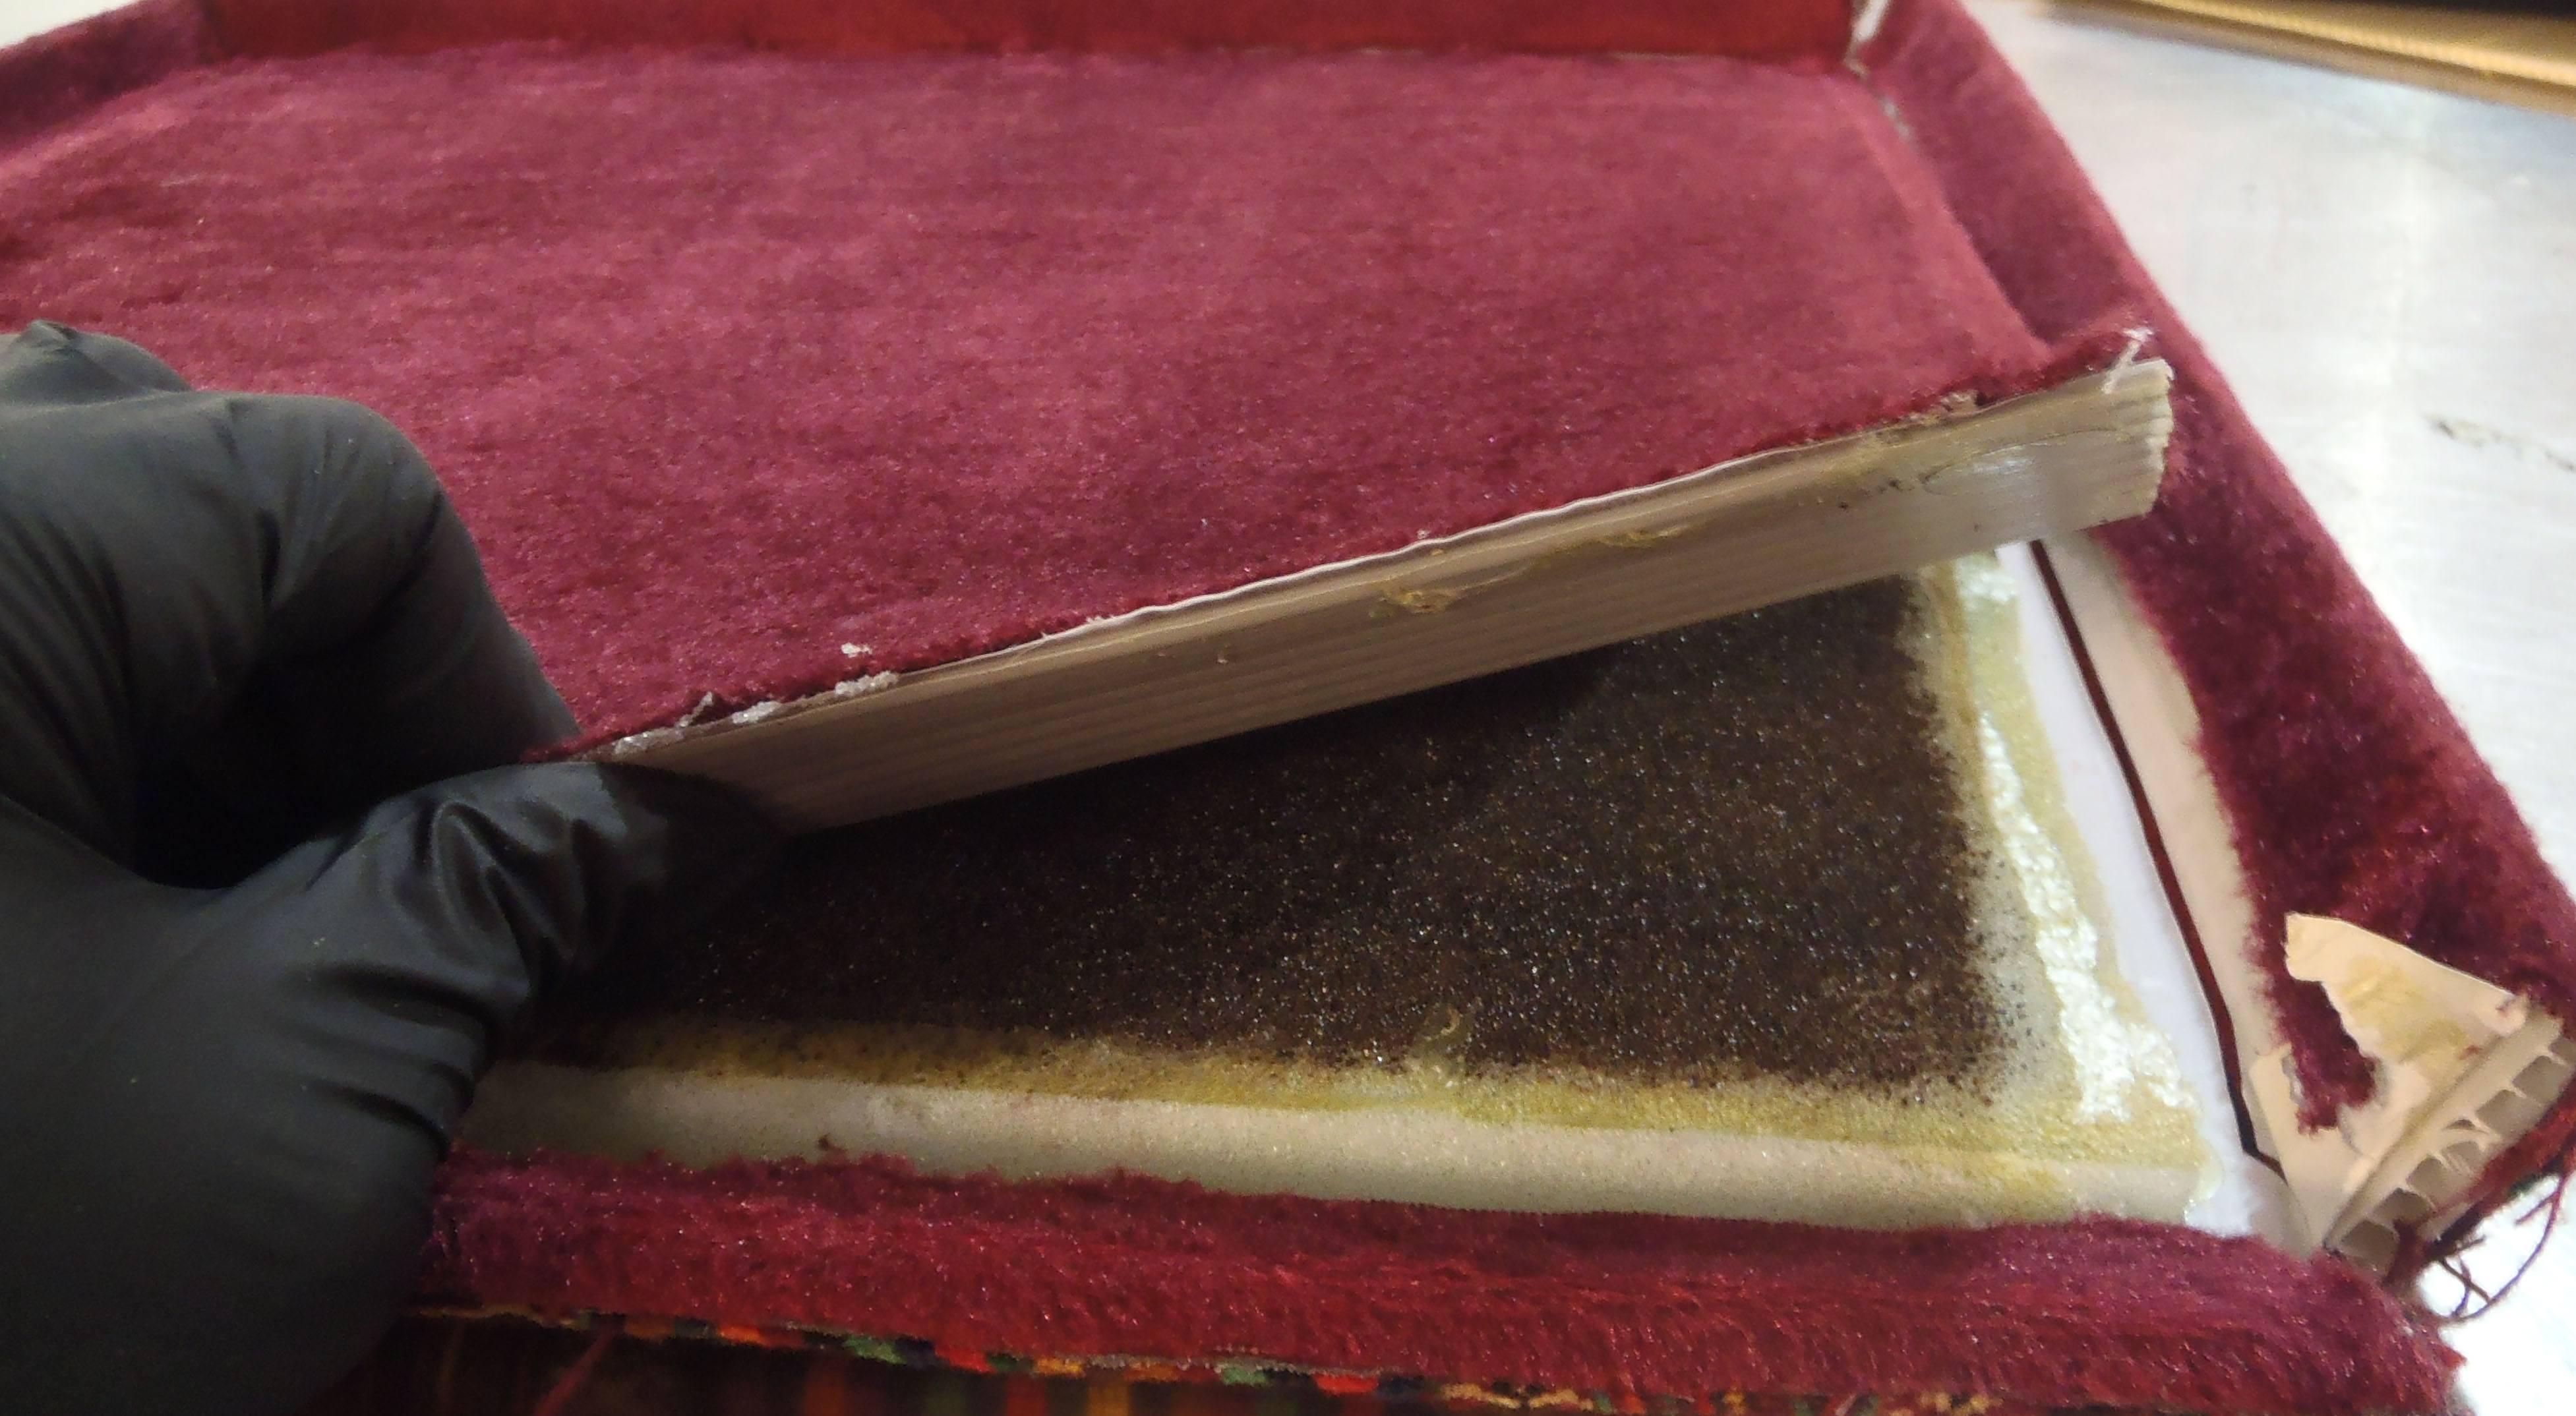 Opium hidden in Iraqi prayer mats seized at Vancouver International Airport